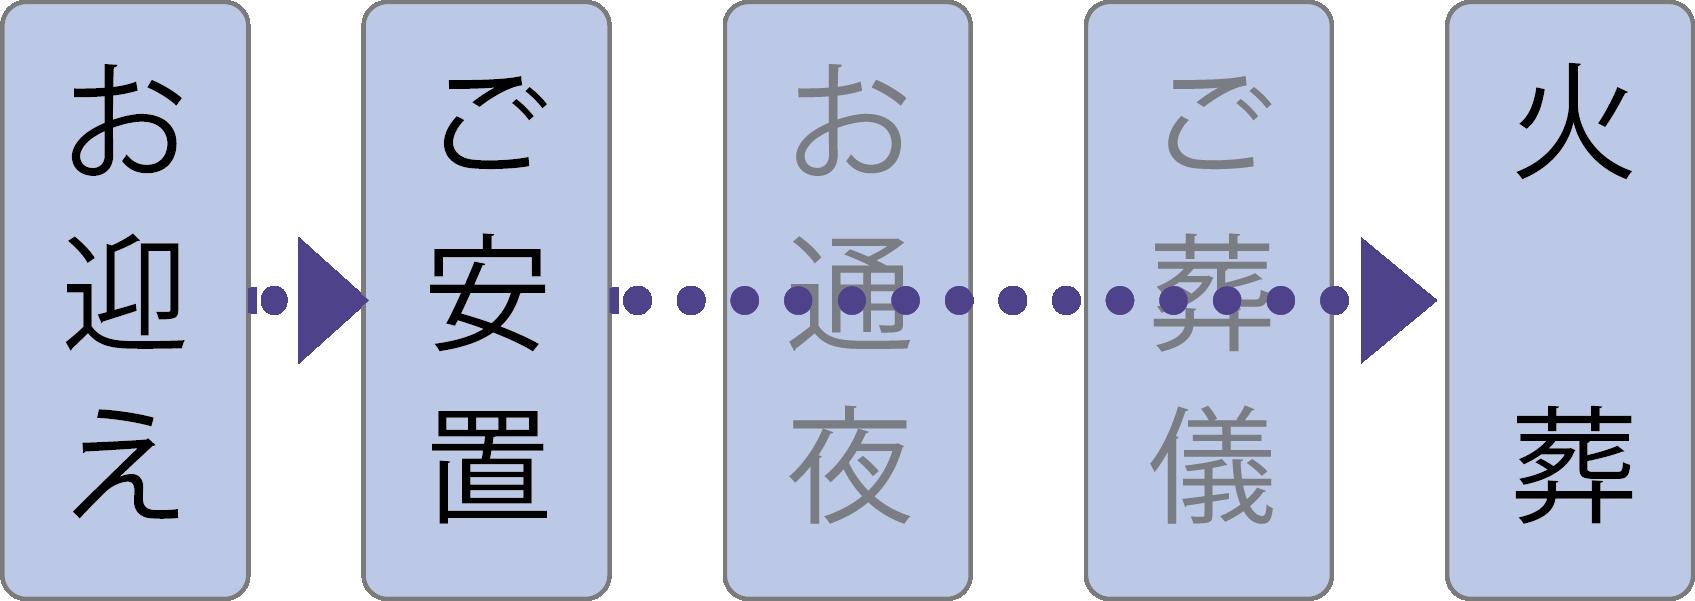 kaso-plan-flow